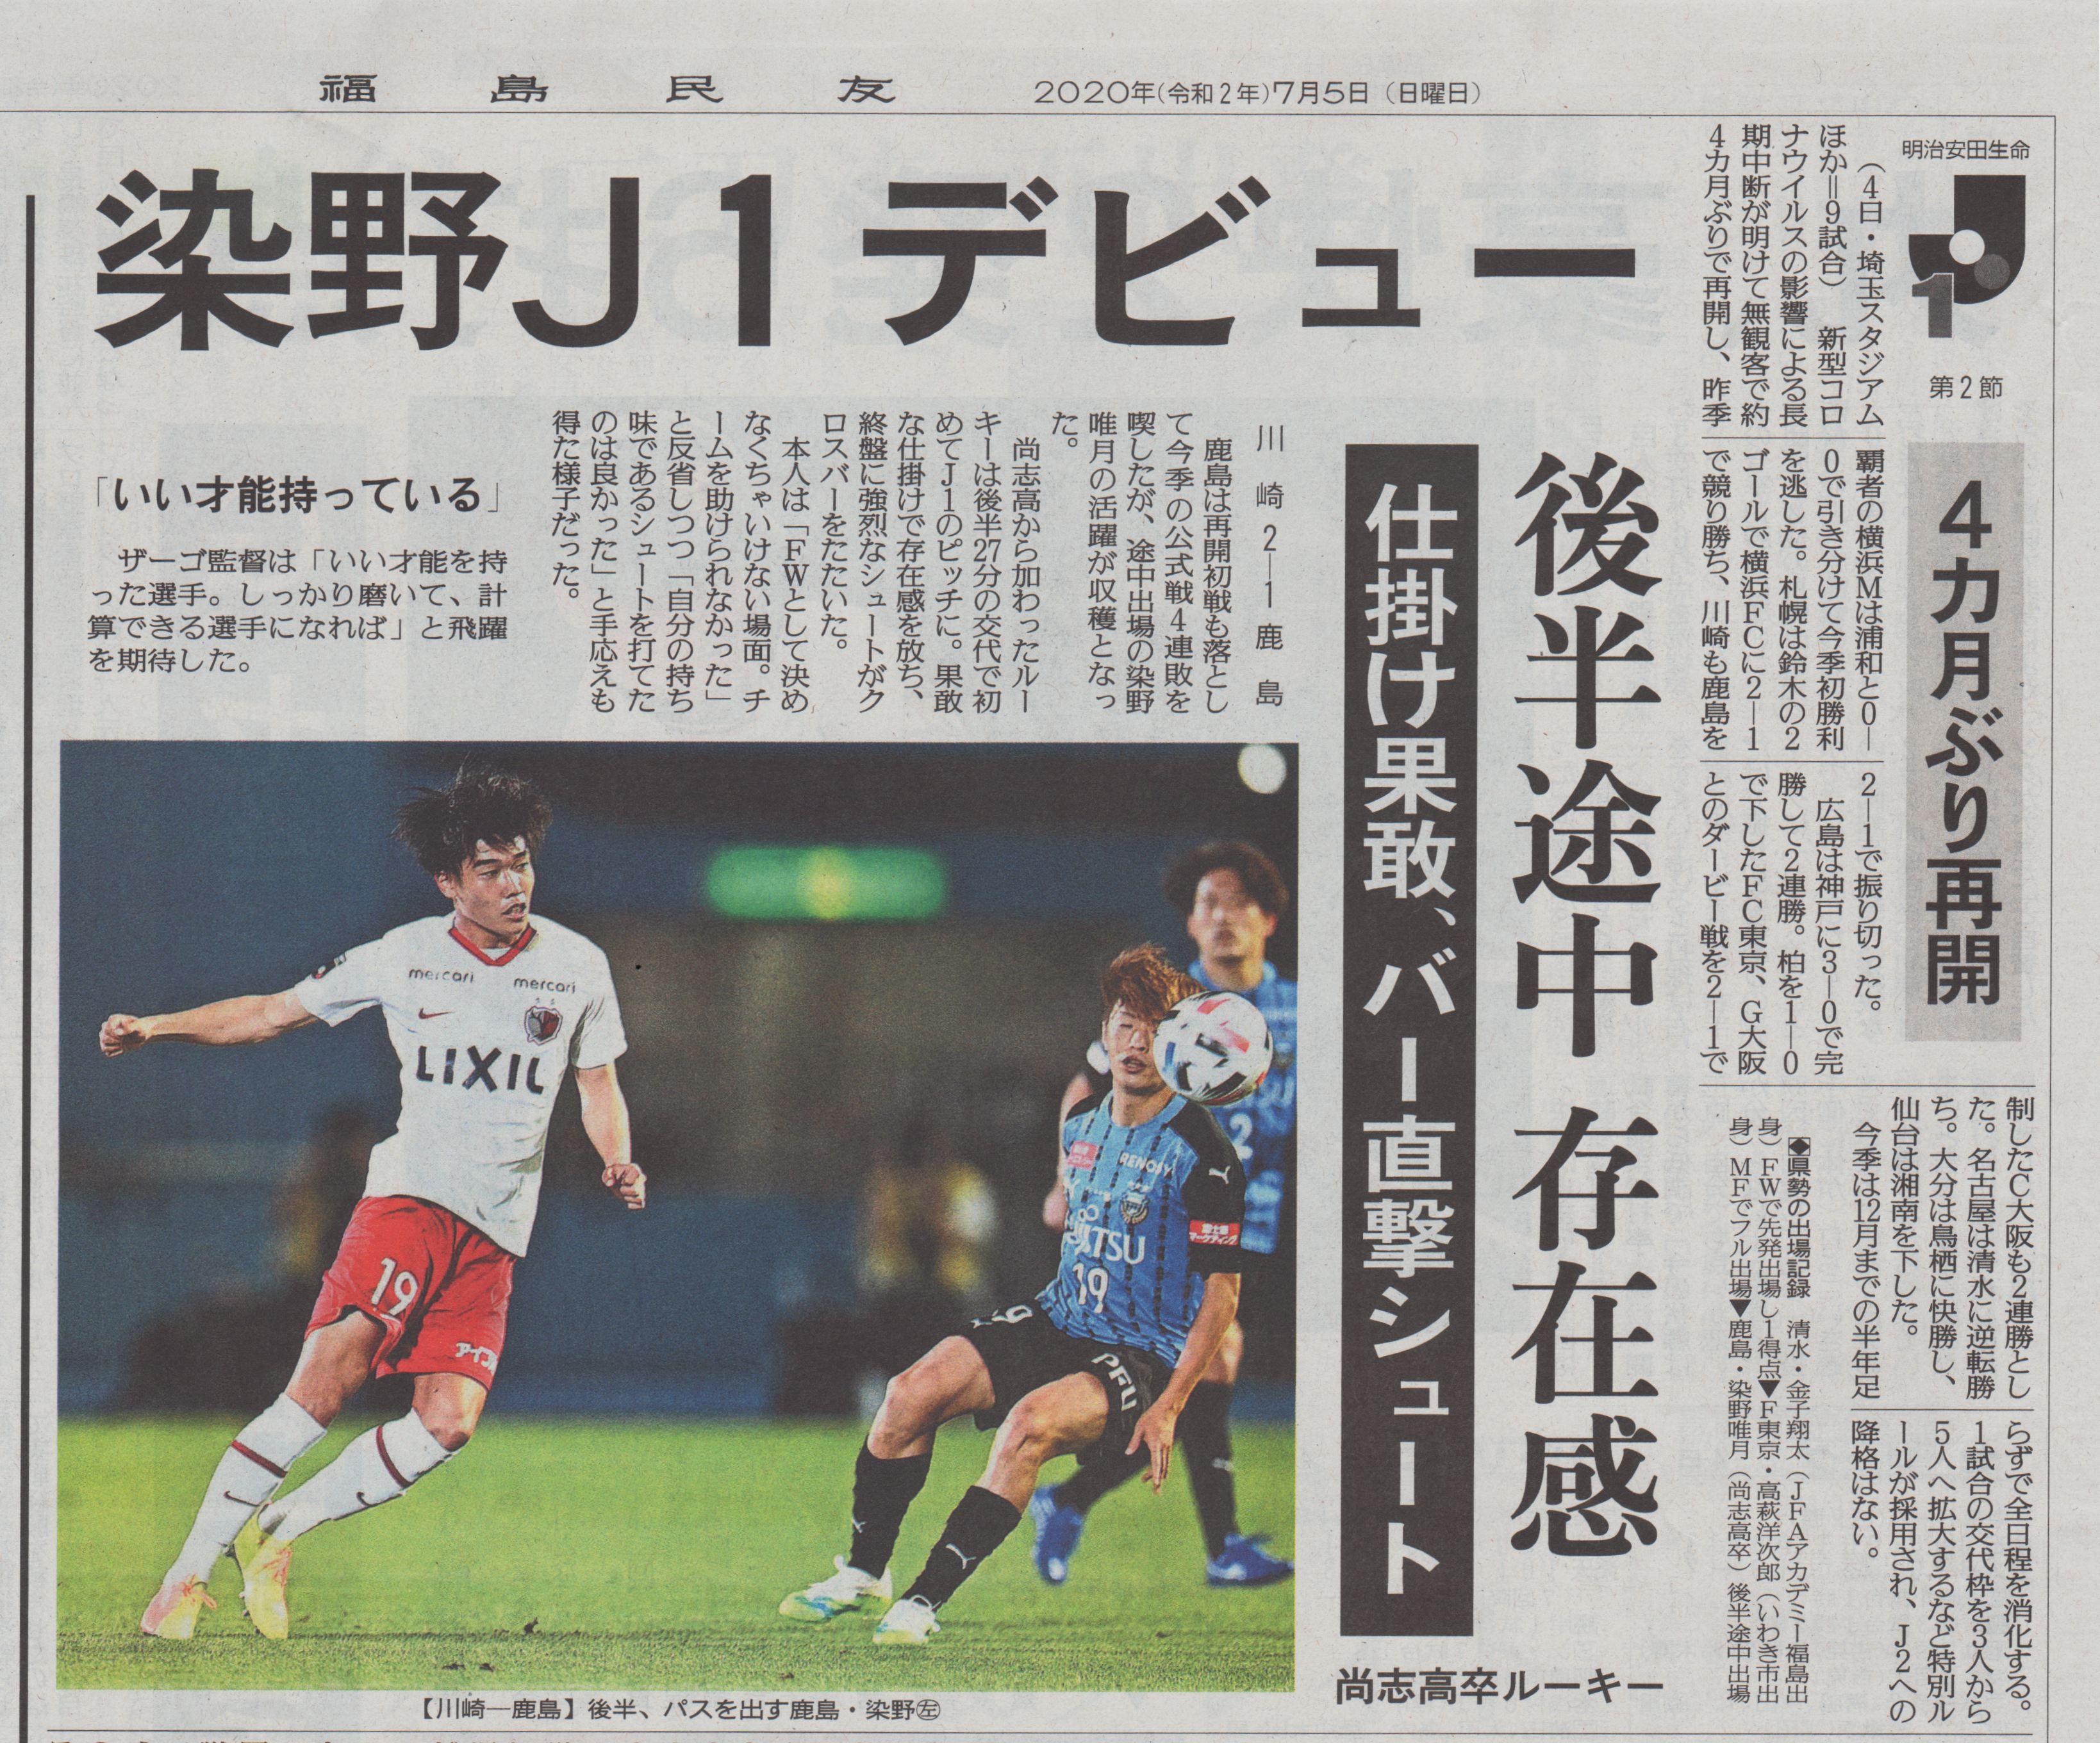 http://www2.shoshi.ed.jp/club/2020.06.05_minyu.jpg